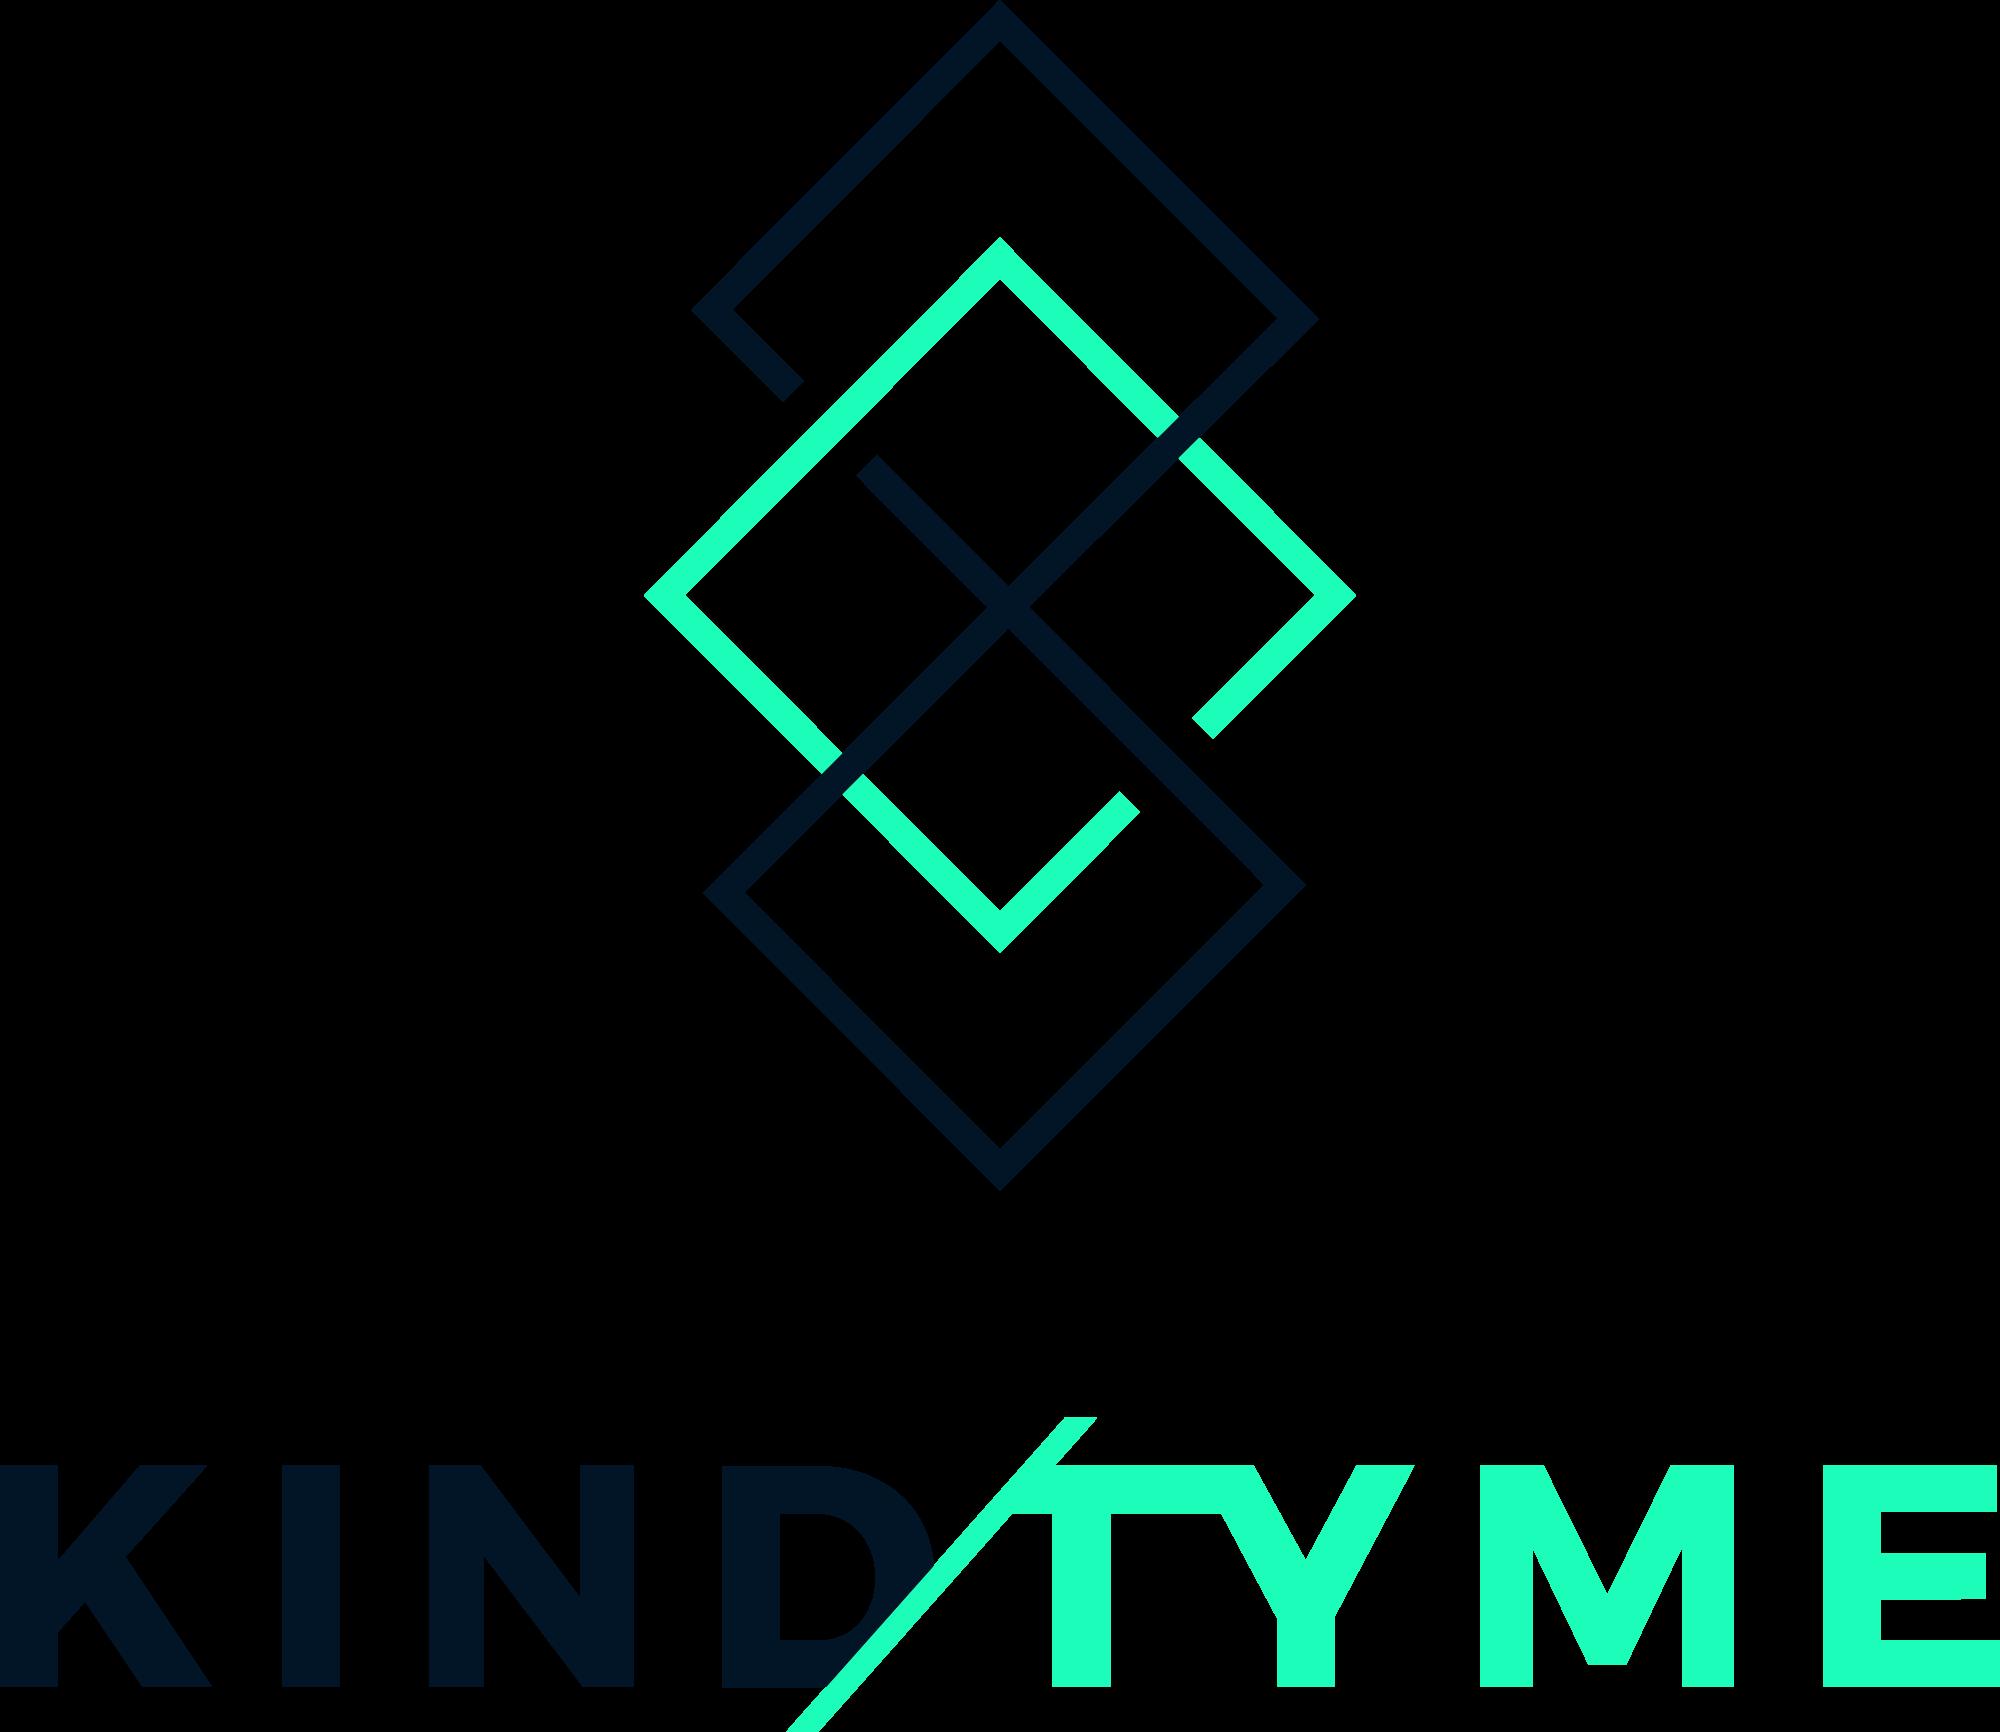 KindTyme-Bud-and-Wordmark-Dark+Mint.png